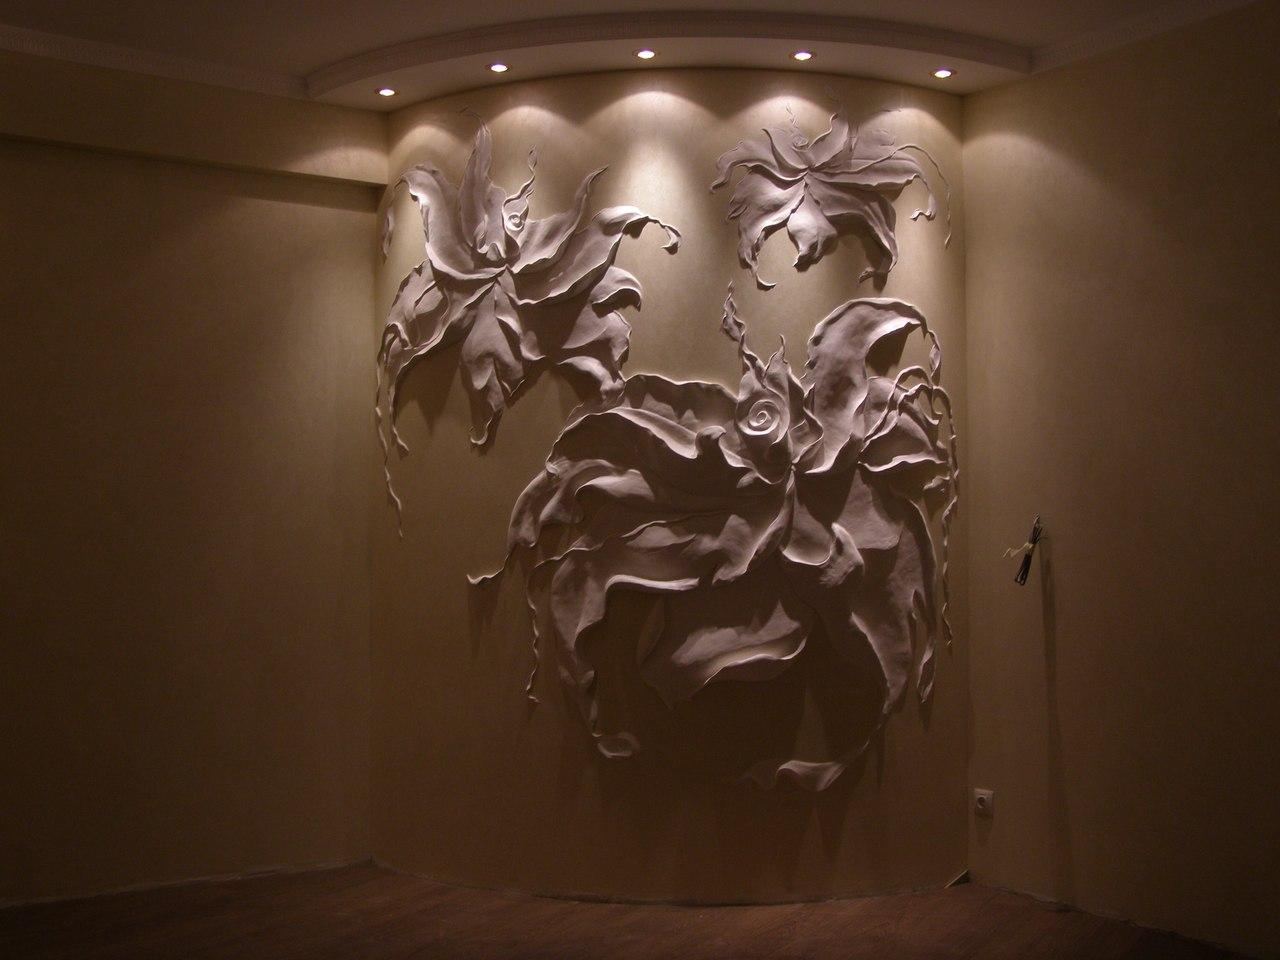 Барельеф на стене своими руками мастер класс